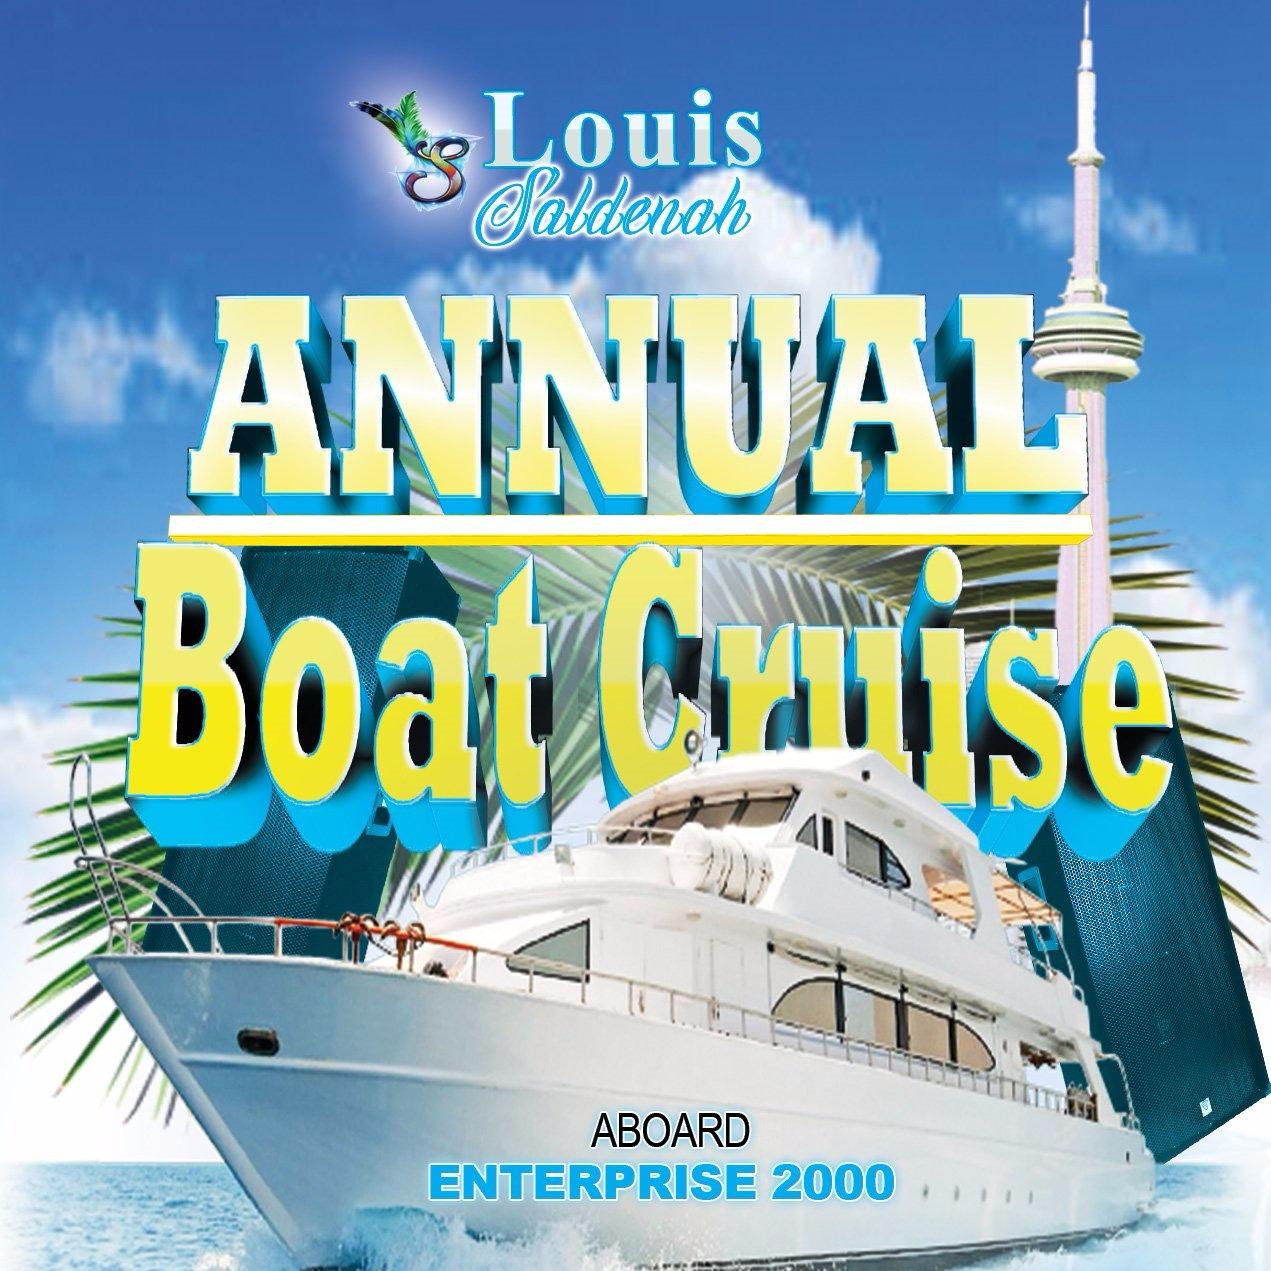 Louis Saldenah Annual Boat Cruise 2017